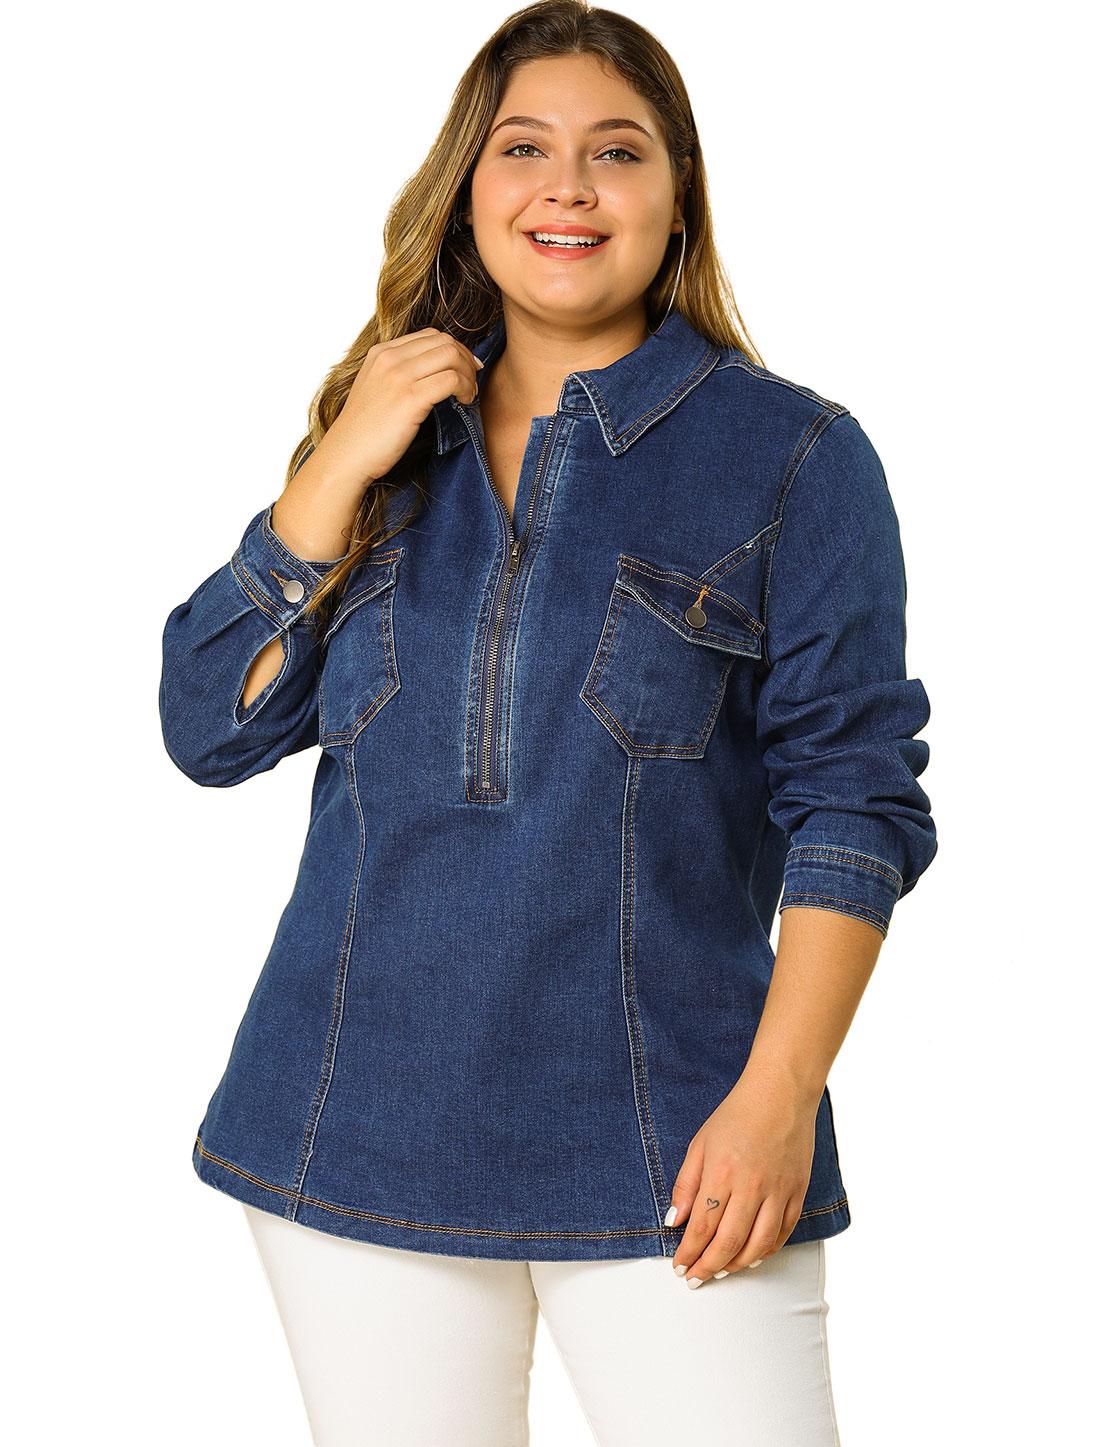 Agnes Orinda Women's Plus Size Zip Up Denim Jacket with Pockets Dark Blue 4X